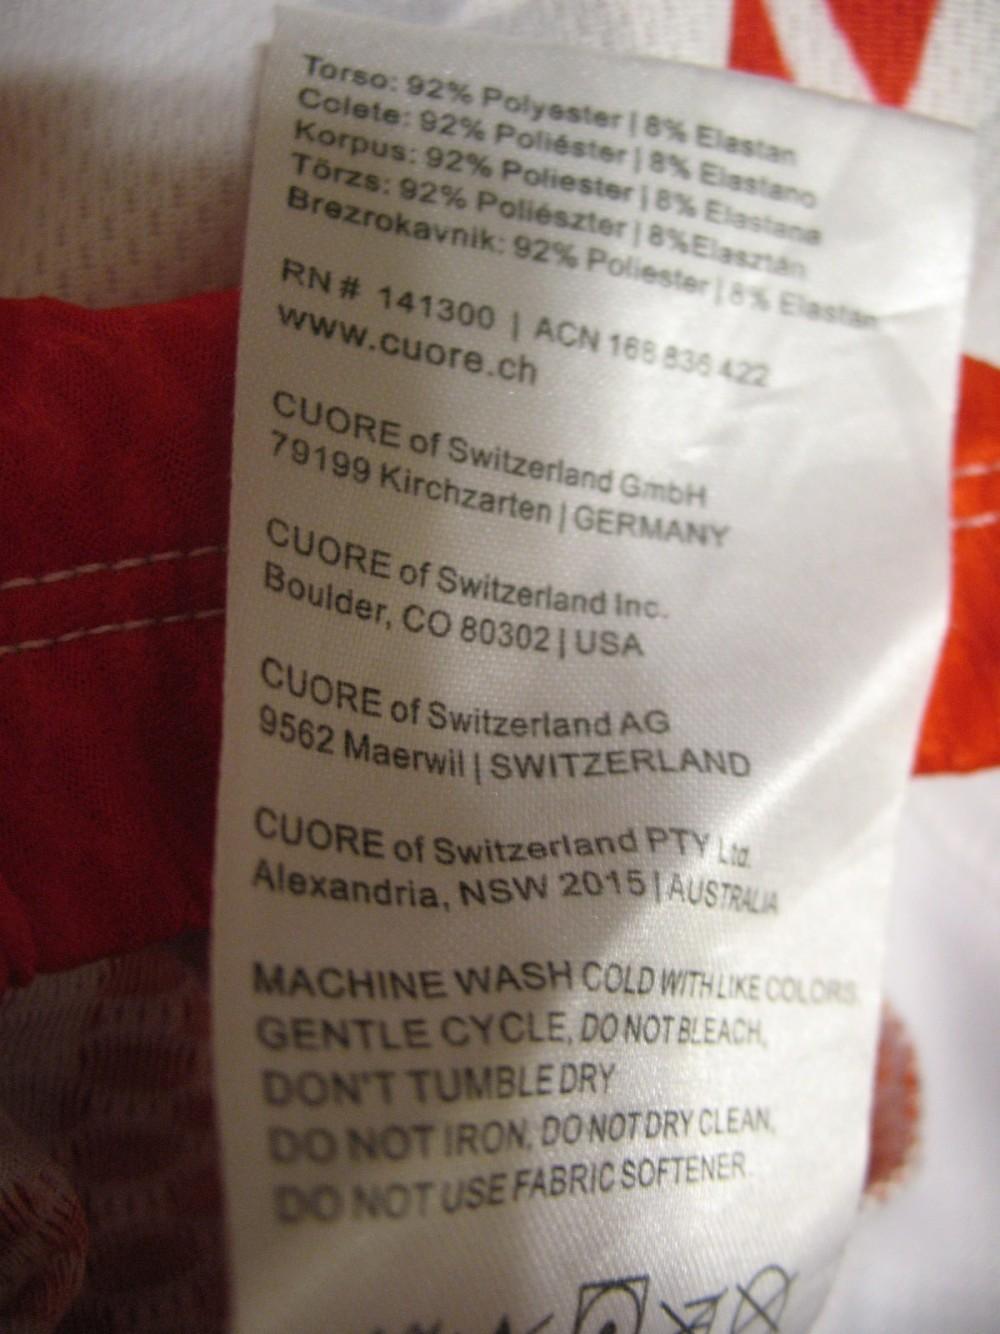 Веломайка CUORE blick trek cycling jersey (размер L) - 3